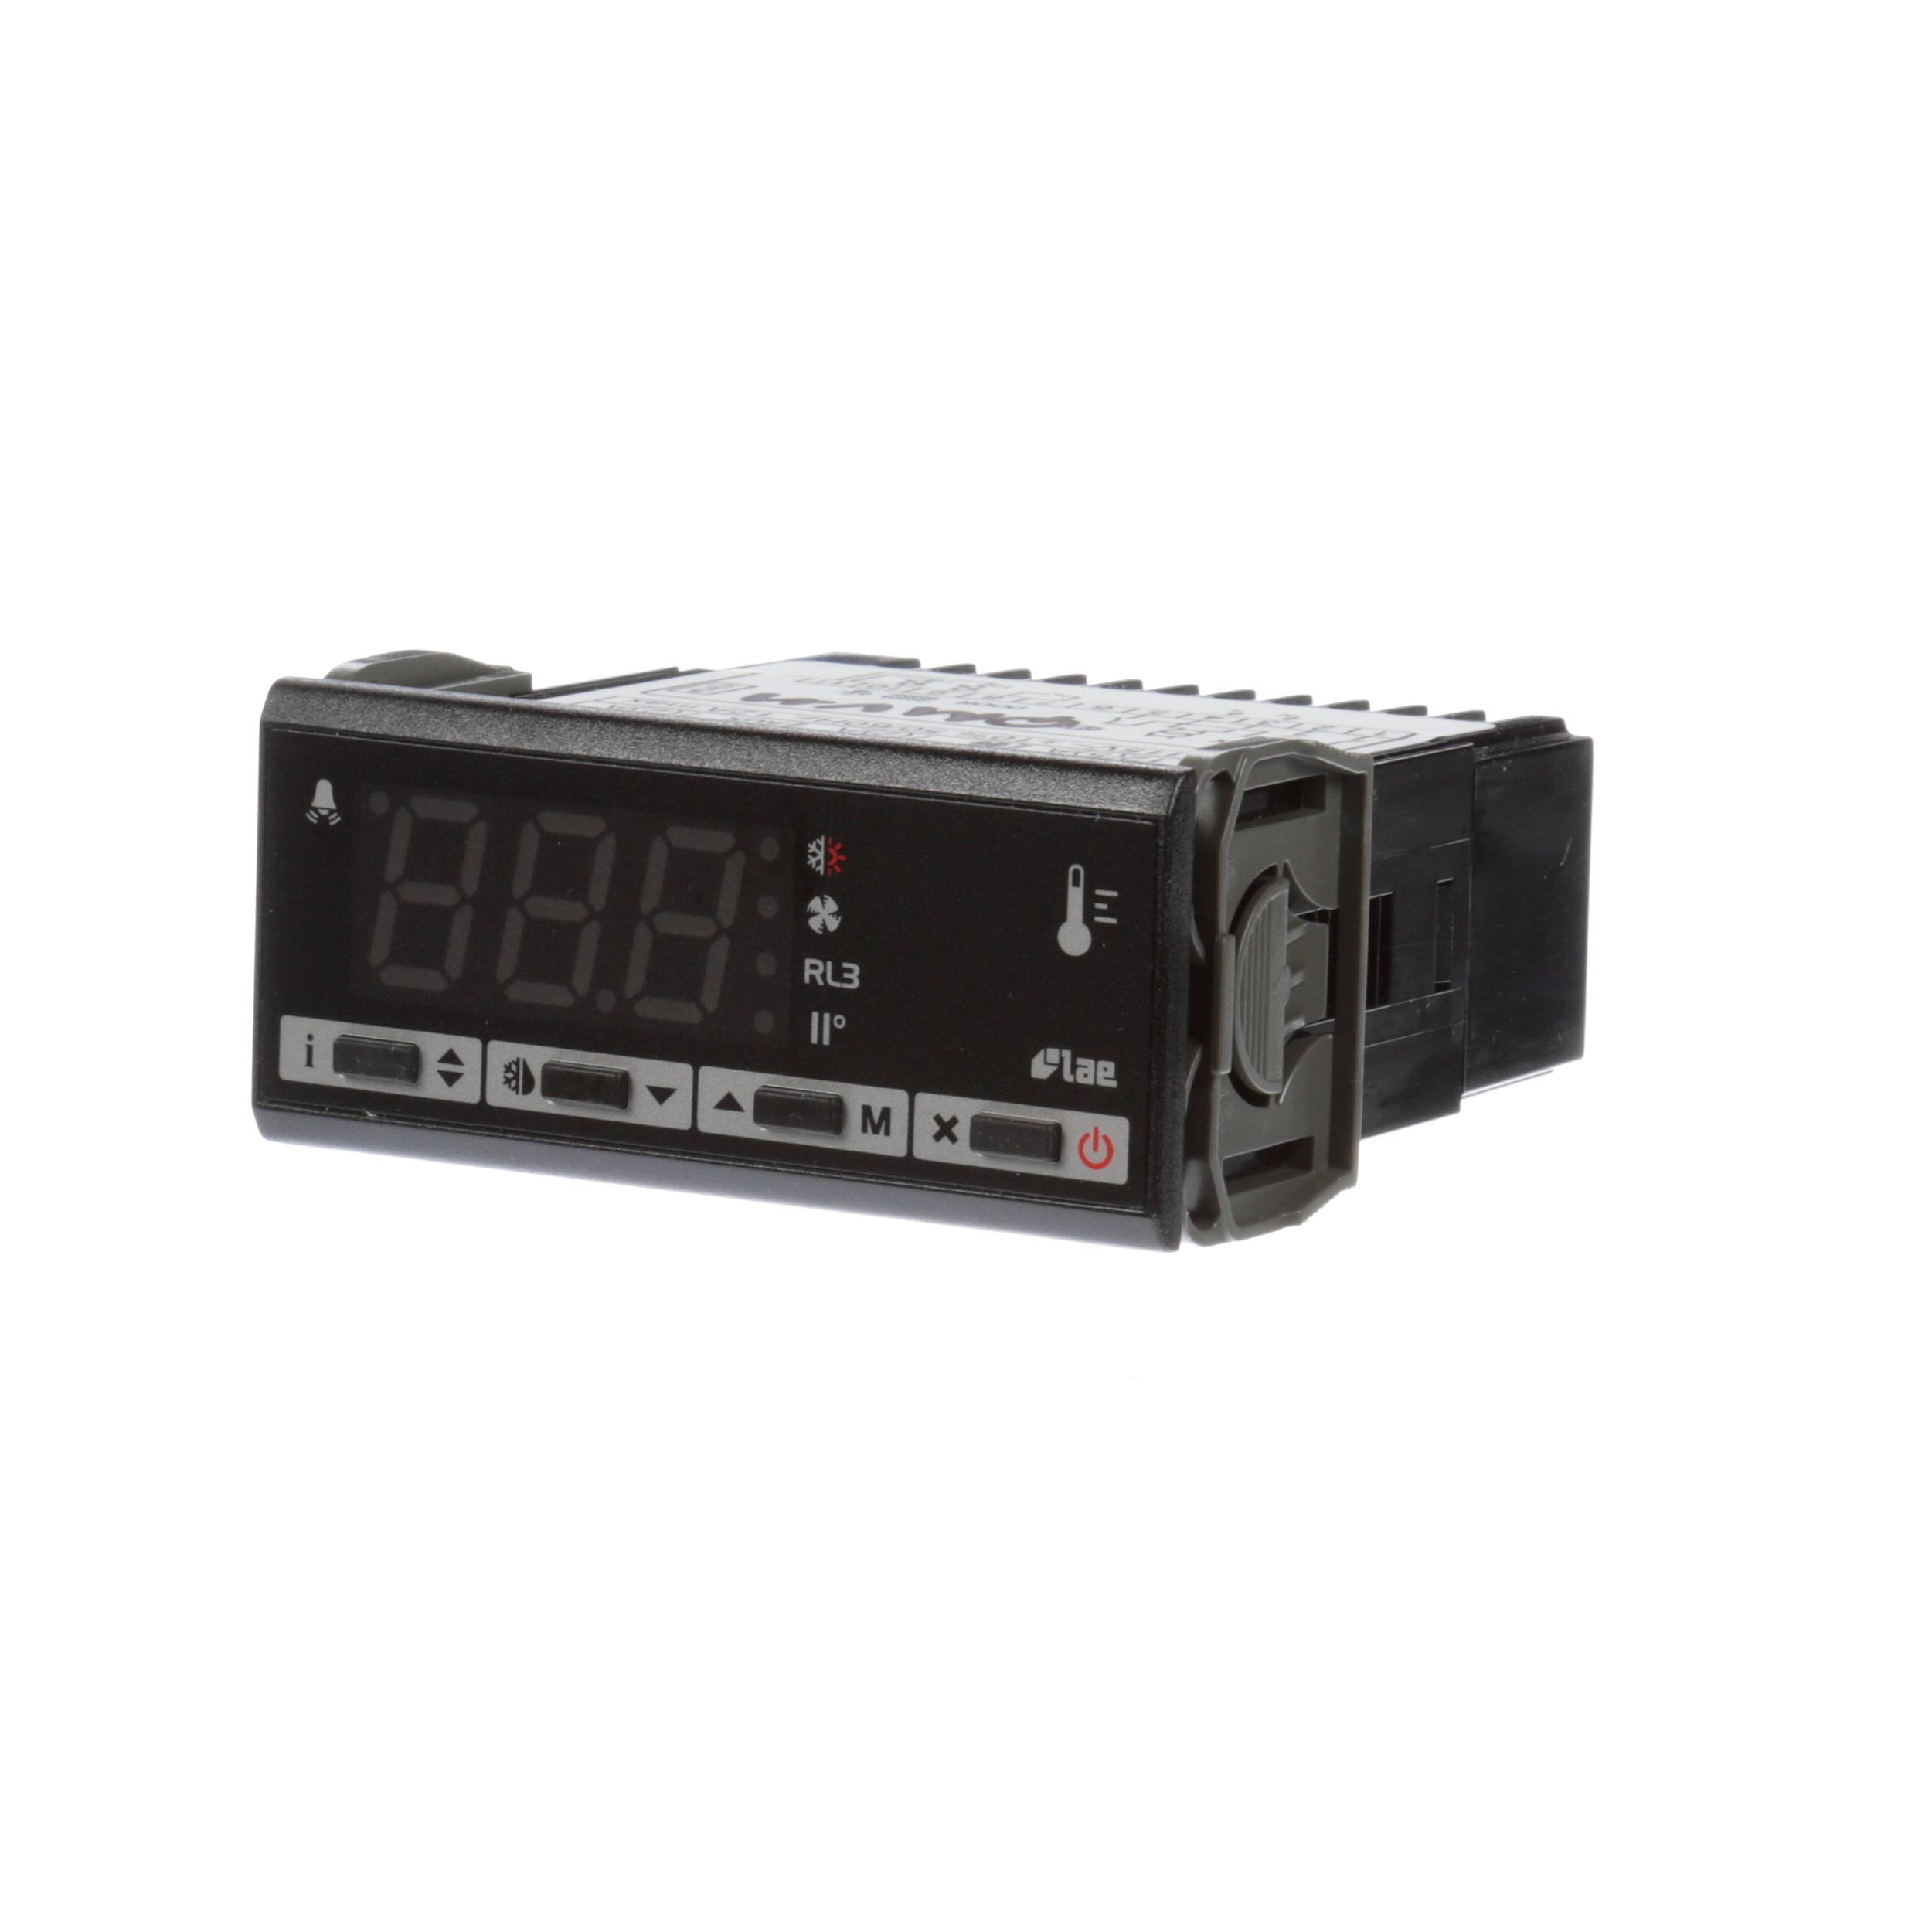 MASTER-BILT CONTROLLER,230V (MODEL QMVM)